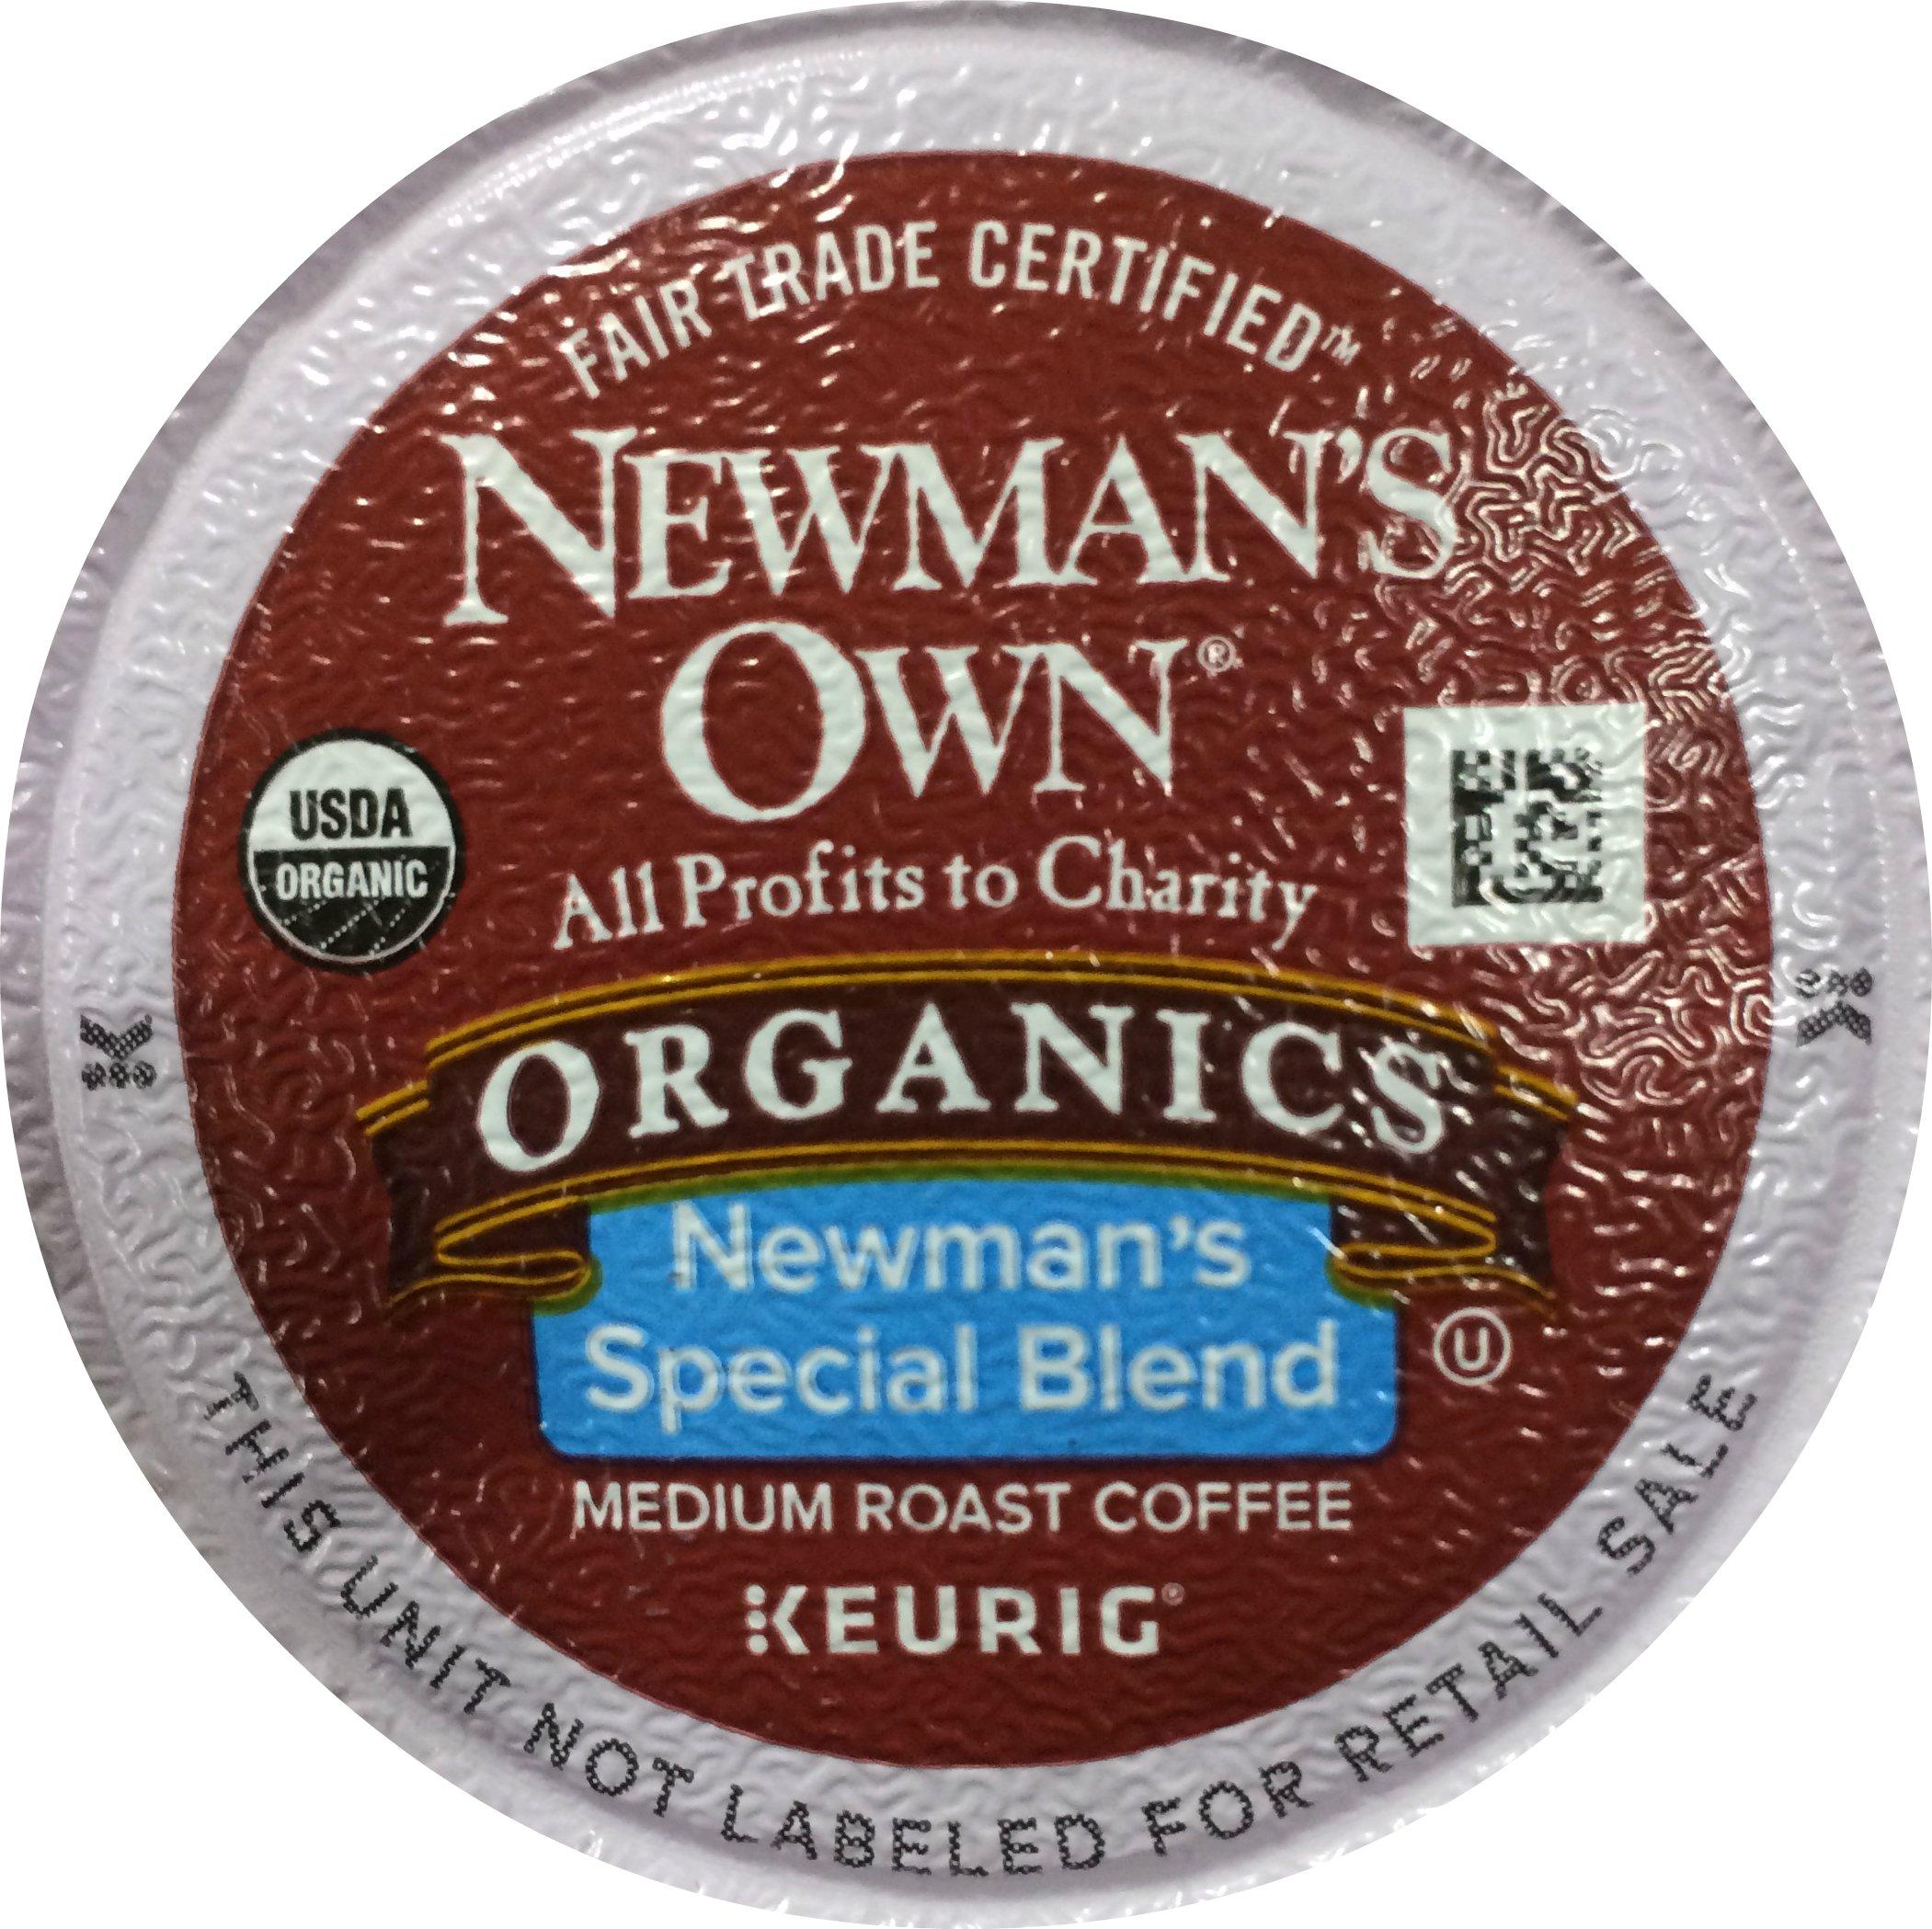 Newman's Own Organics Special Blend Coffee K-Cups (100 K-Cups) - Packaging May Vary by Newman's Own Organics